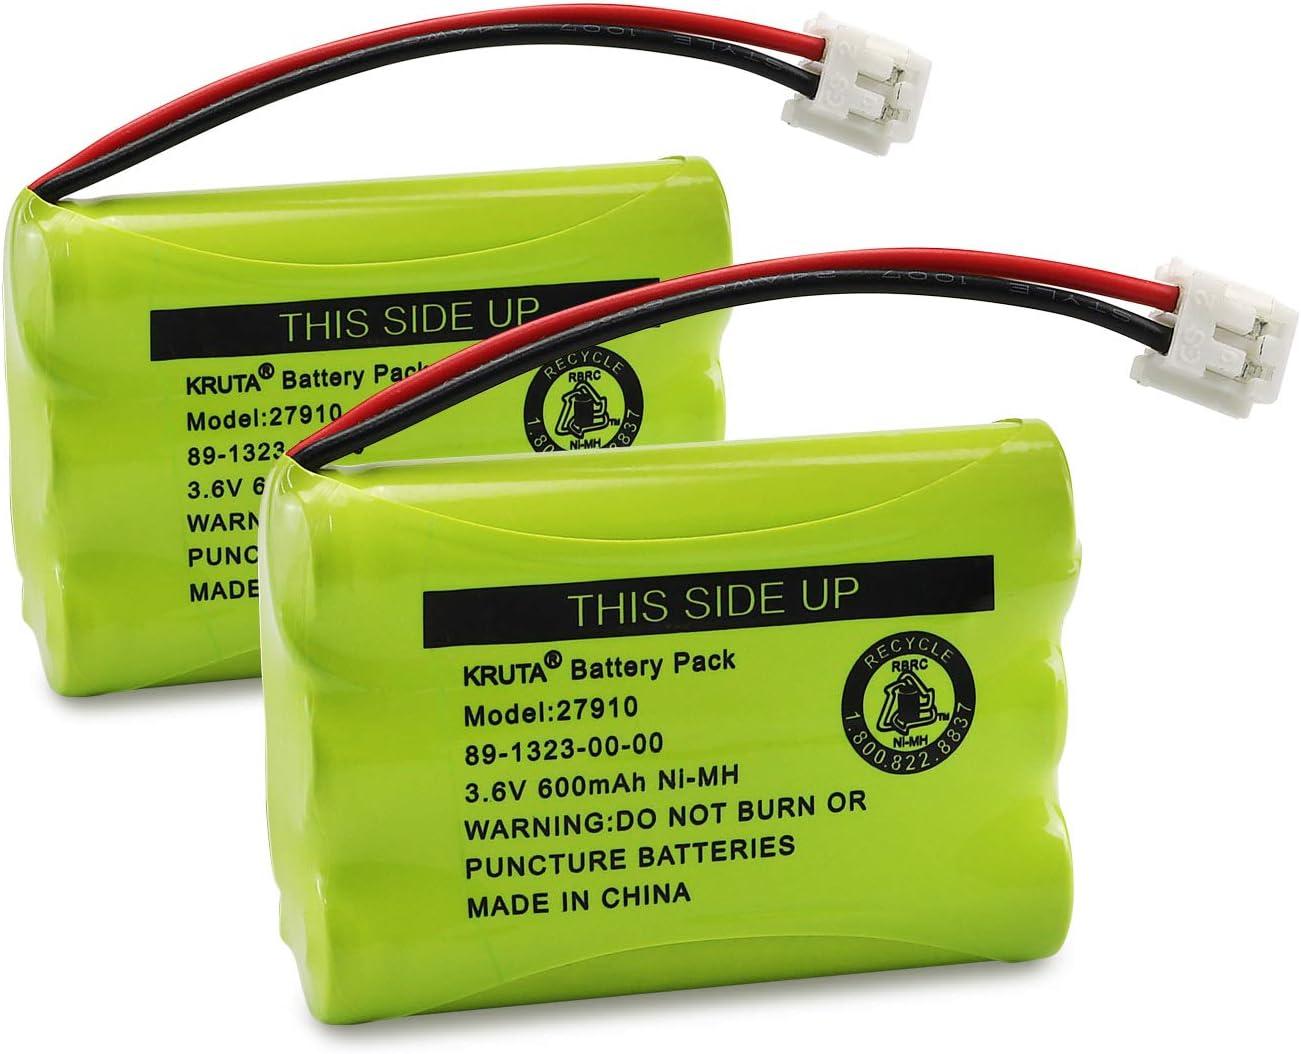 27910 Cordless Telephone Battery Compatible with AT&T 89-1323-00-0 Motorola SD-7501 RadioShack 23-959 23-894 Ni-MH 3.6V(Pack 2)